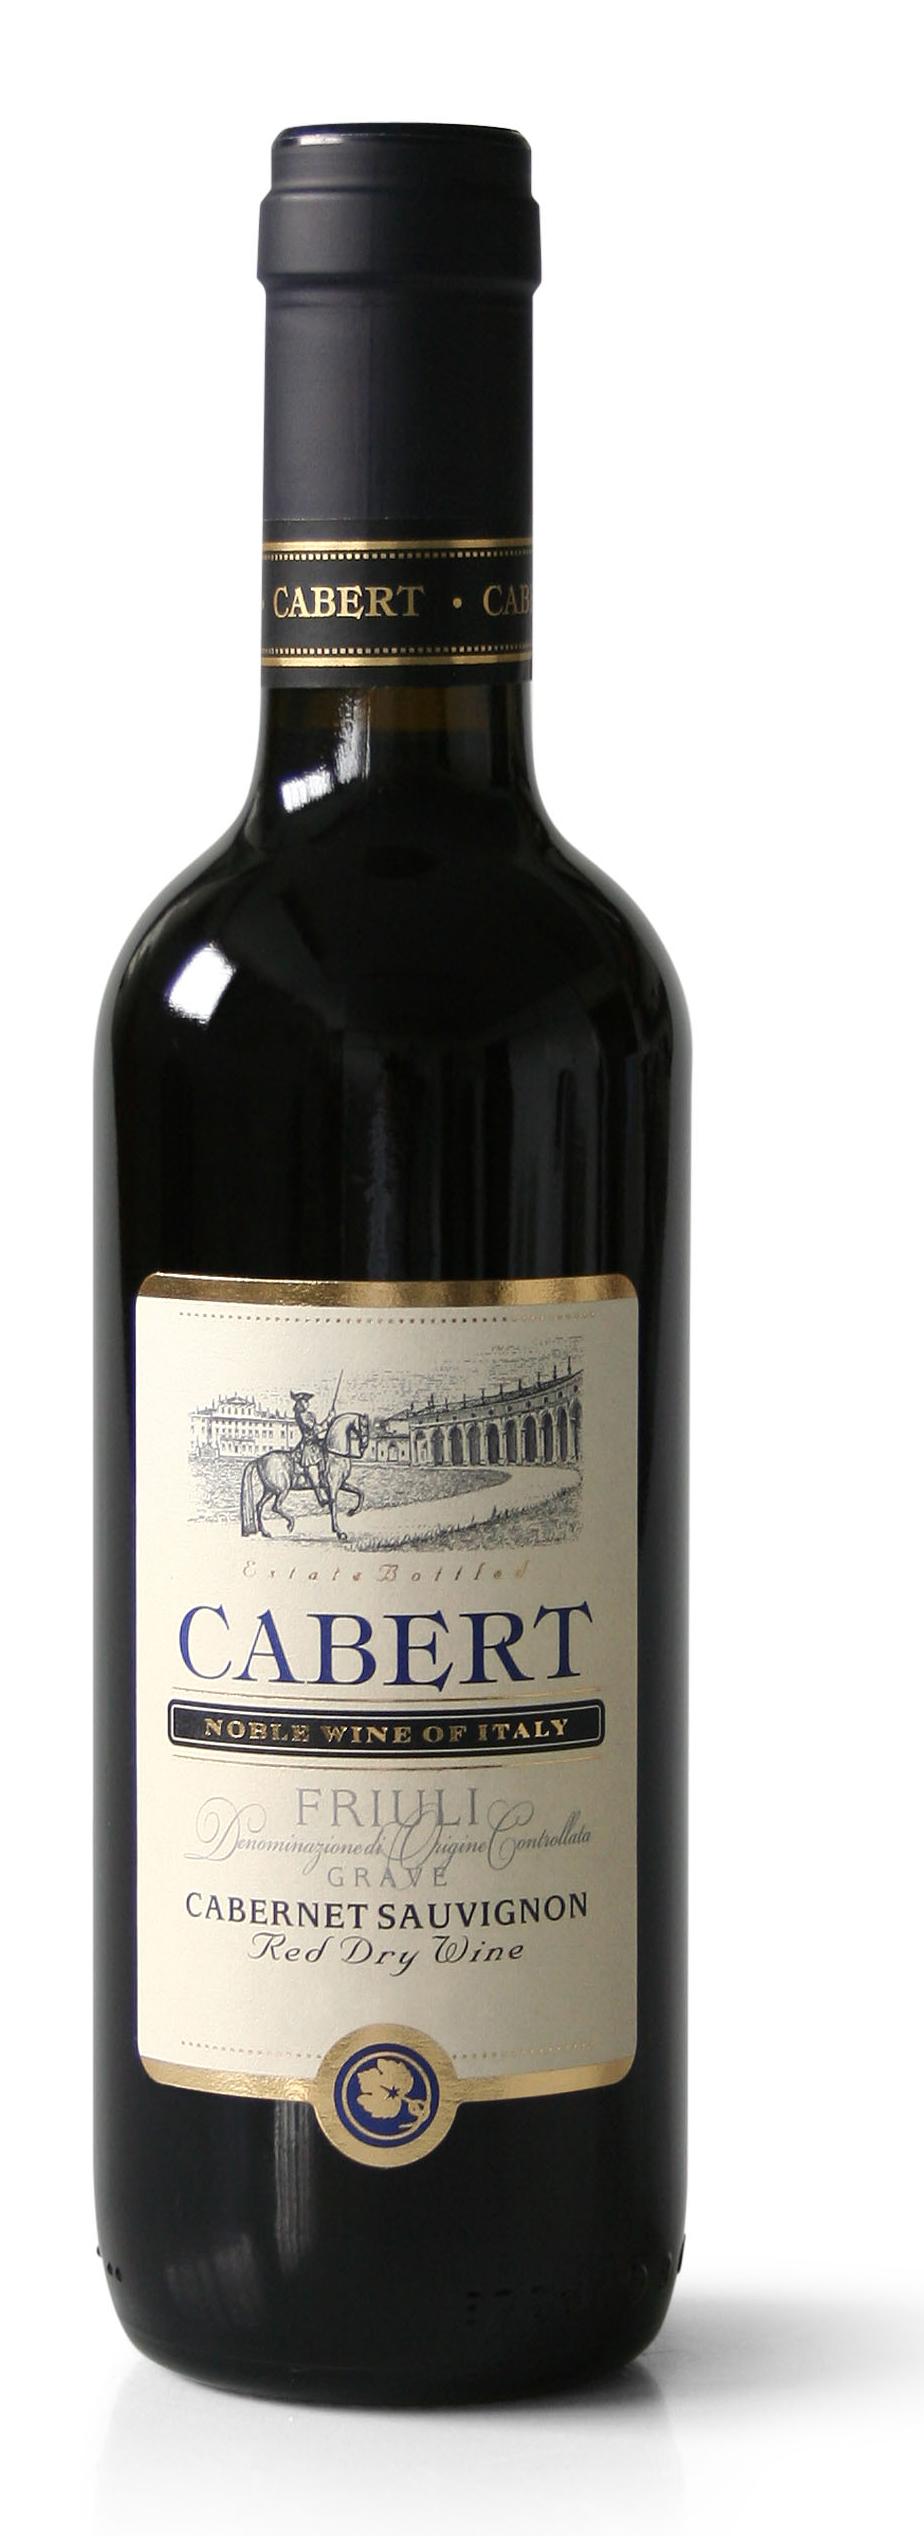 Bertiolo Cabernet Sauvignon DOP Cabert 375ml